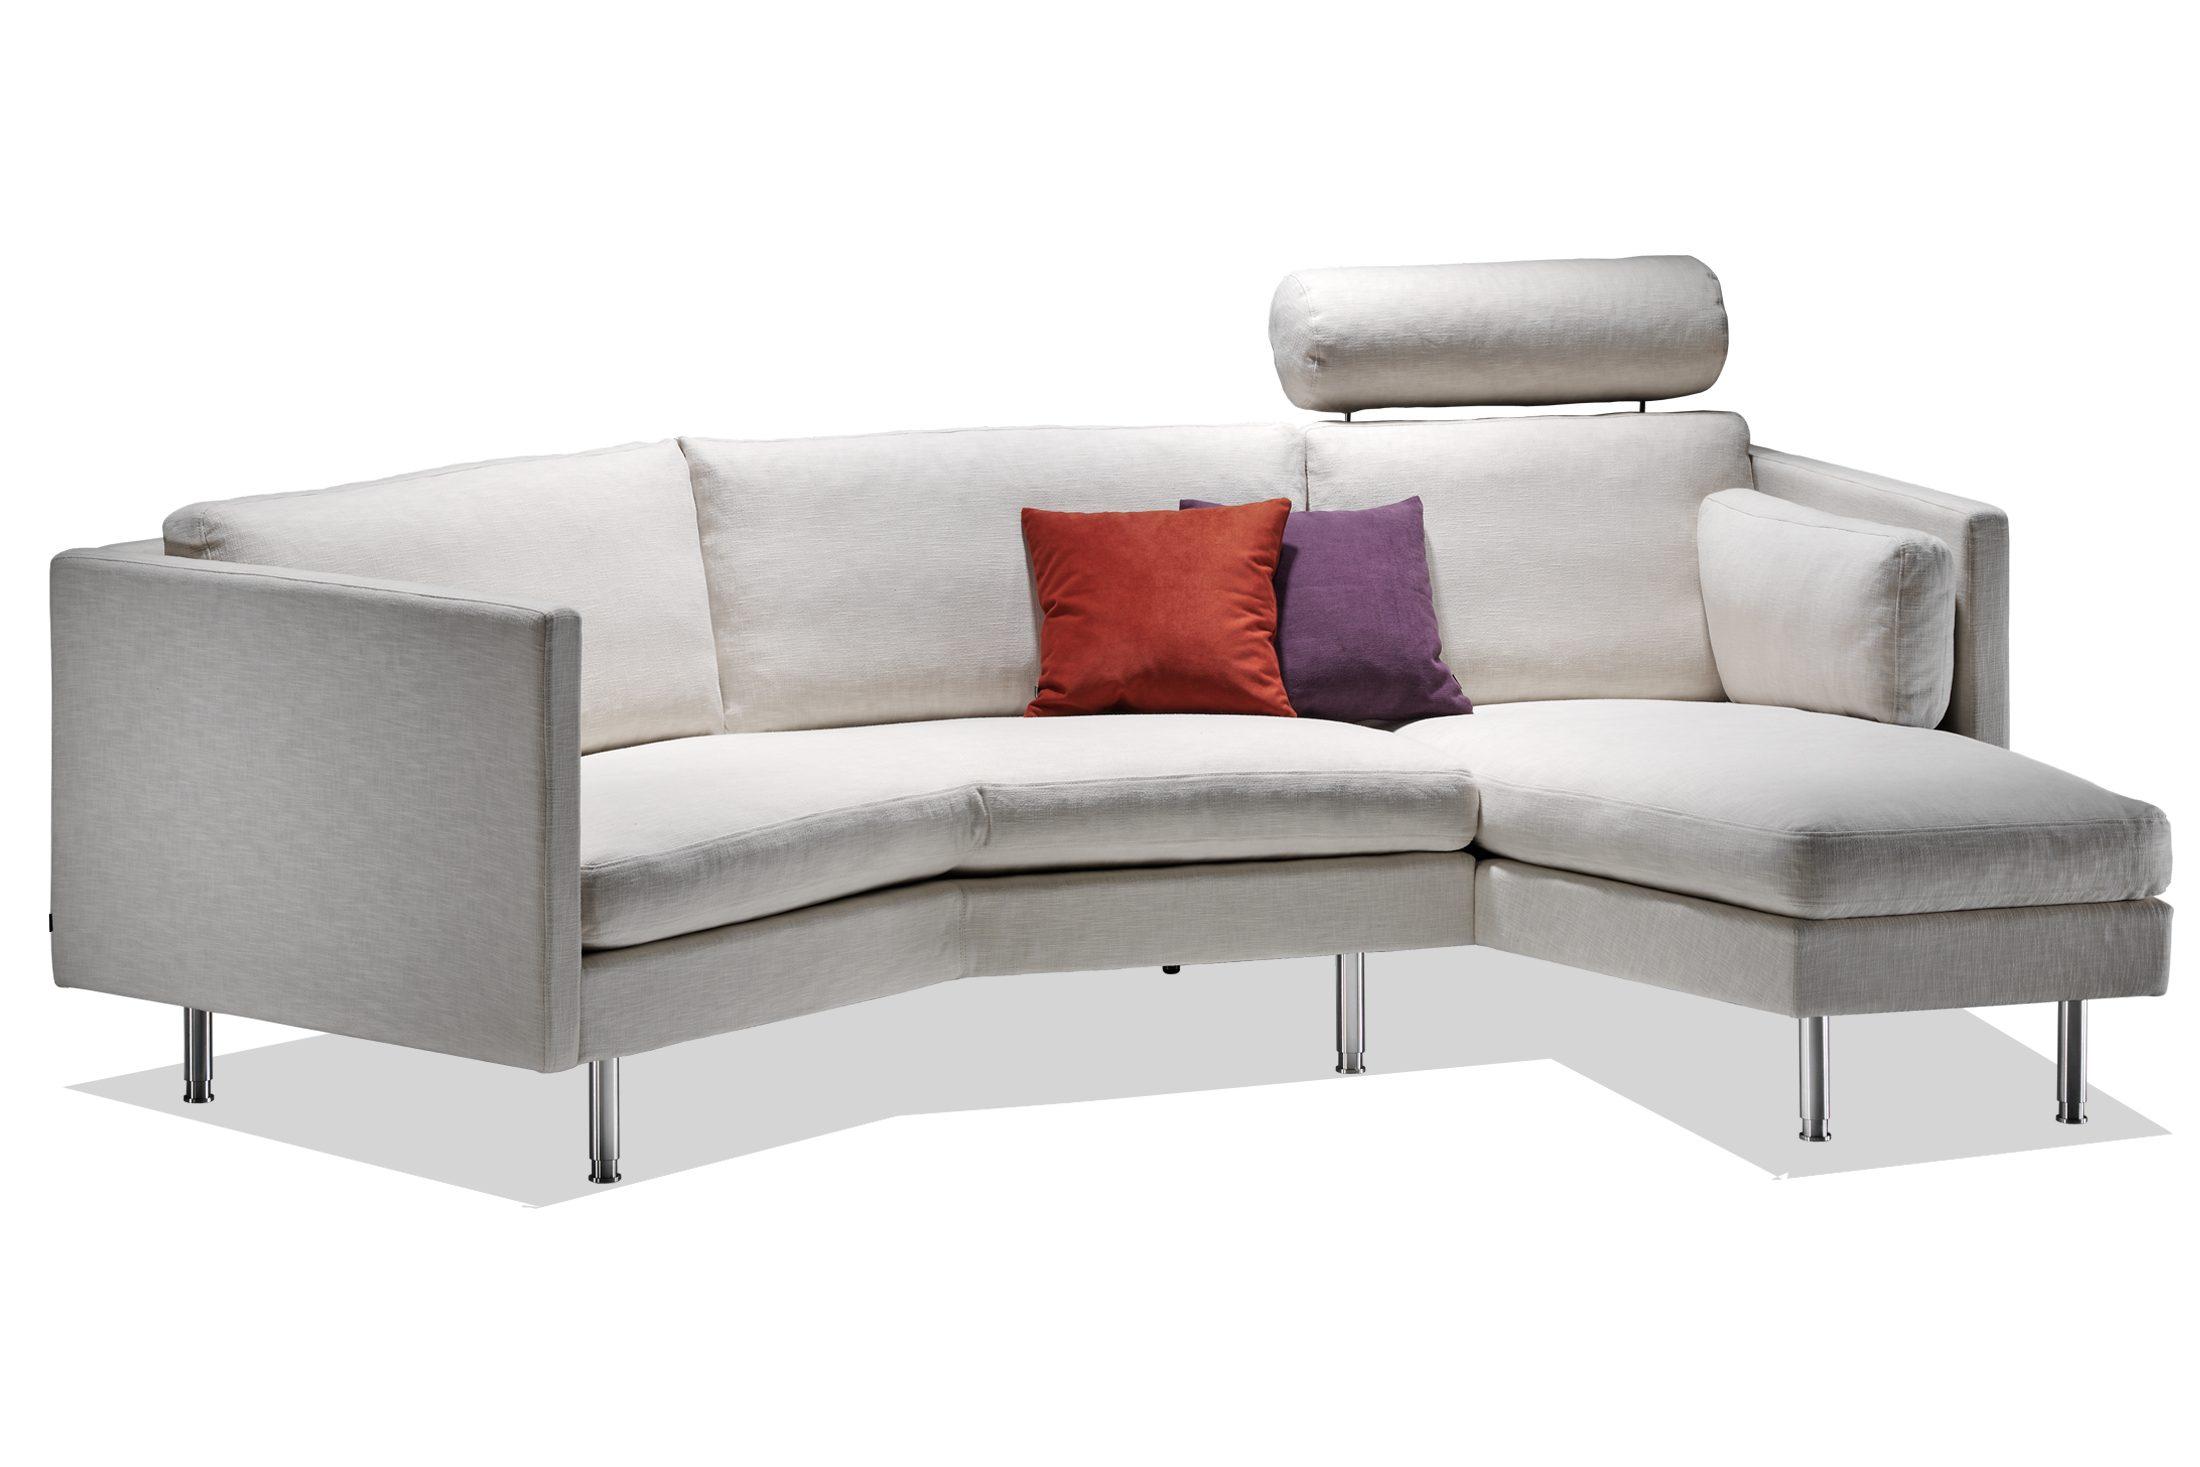 rund sofa latest rund sofa with rund sofa beautiful monaruge monarug ecksofa sofa ecksofa. Black Bedroom Furniture Sets. Home Design Ideas